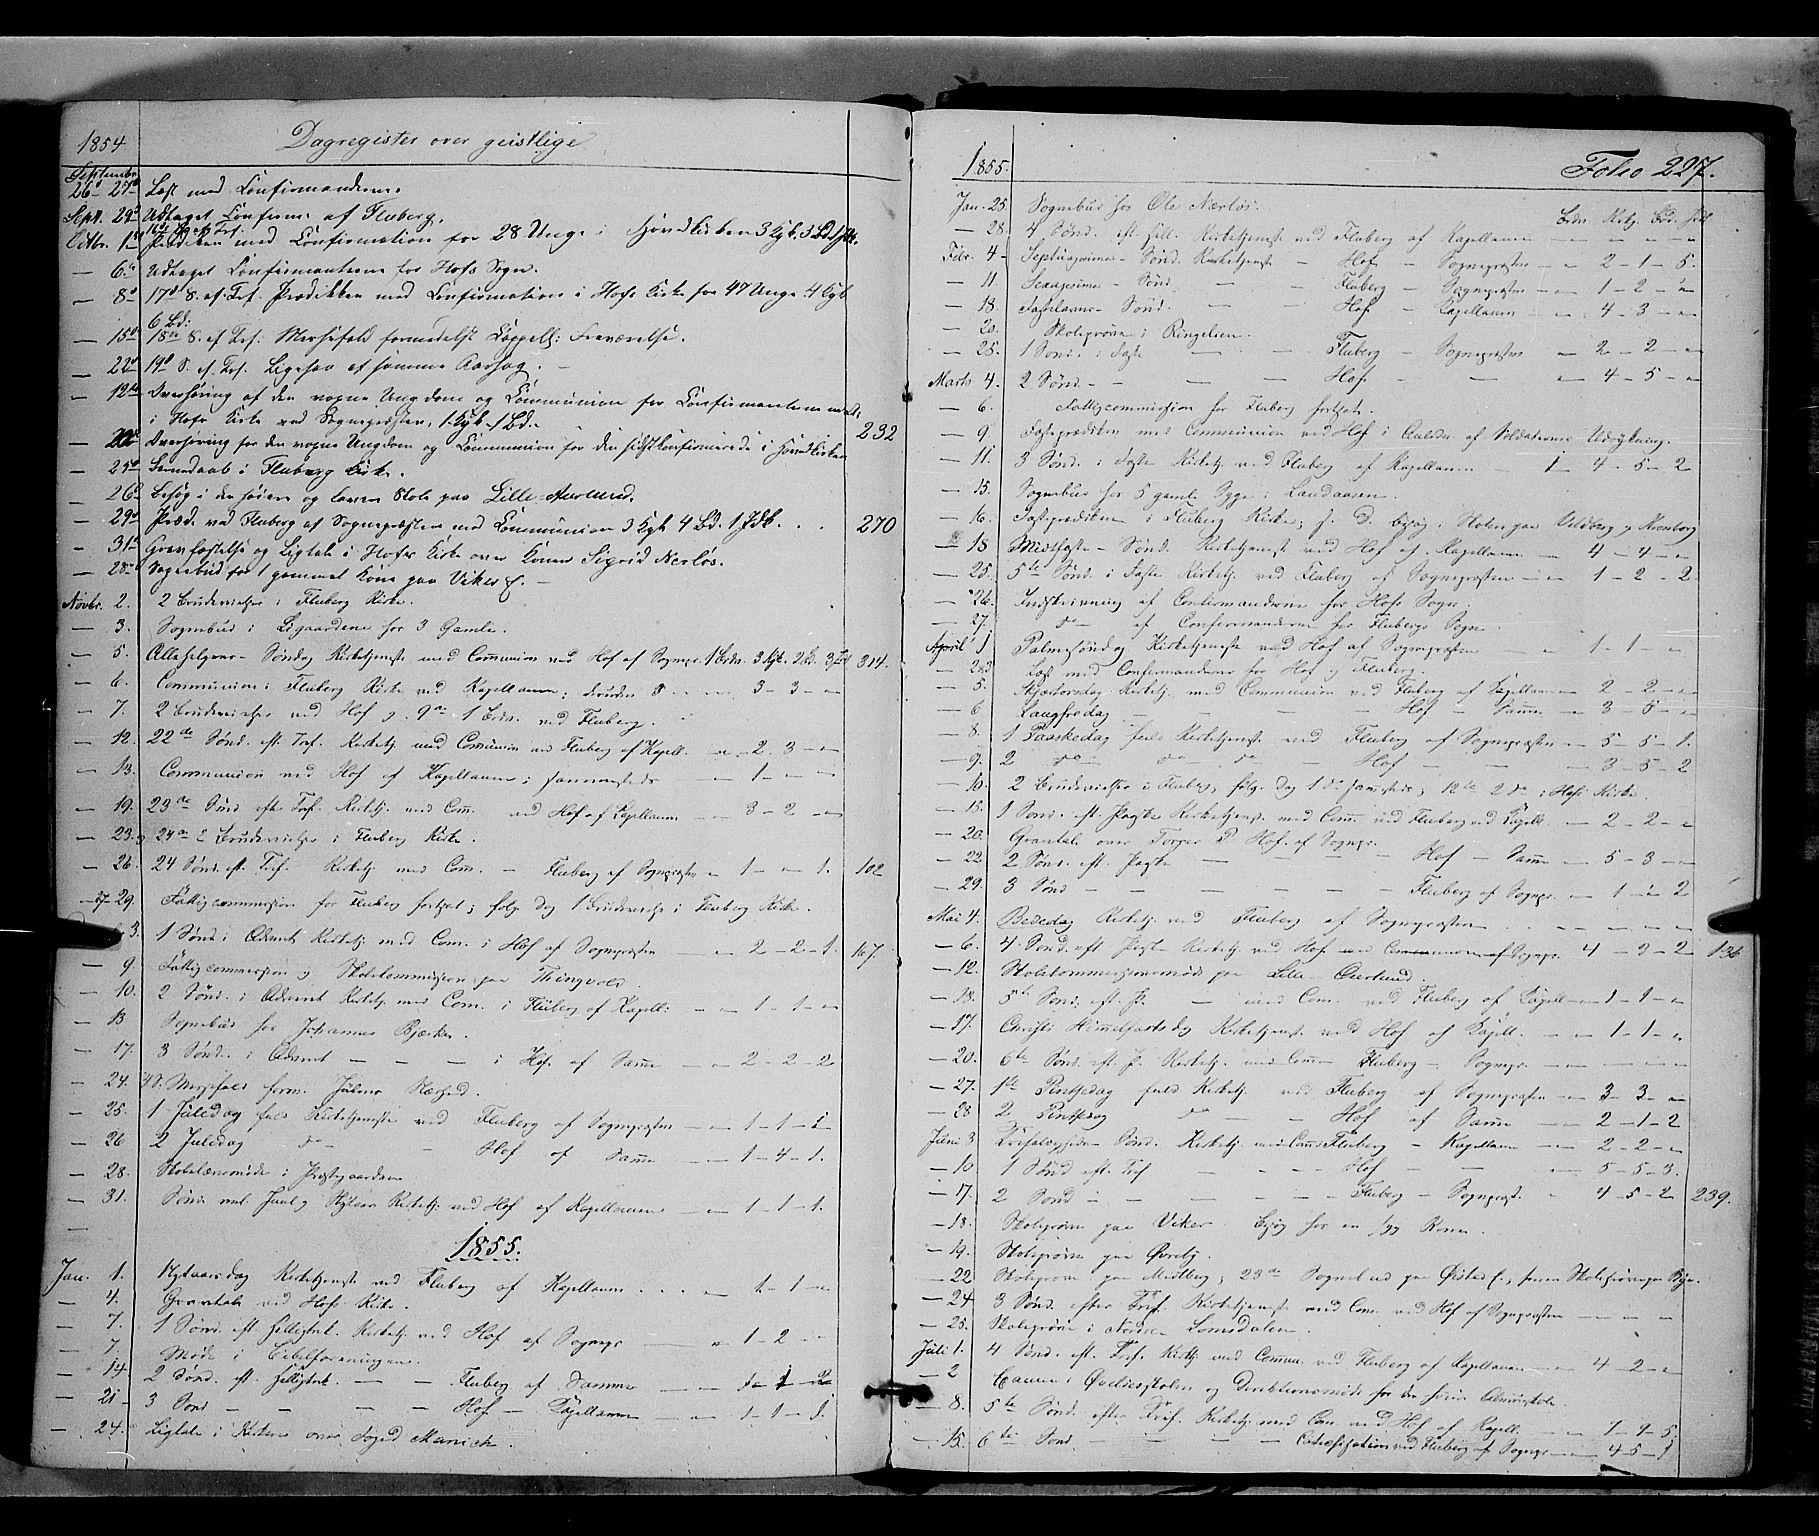 SAH, Land prestekontor, Ministerialbok nr. 9, 1847-1859, s. 227